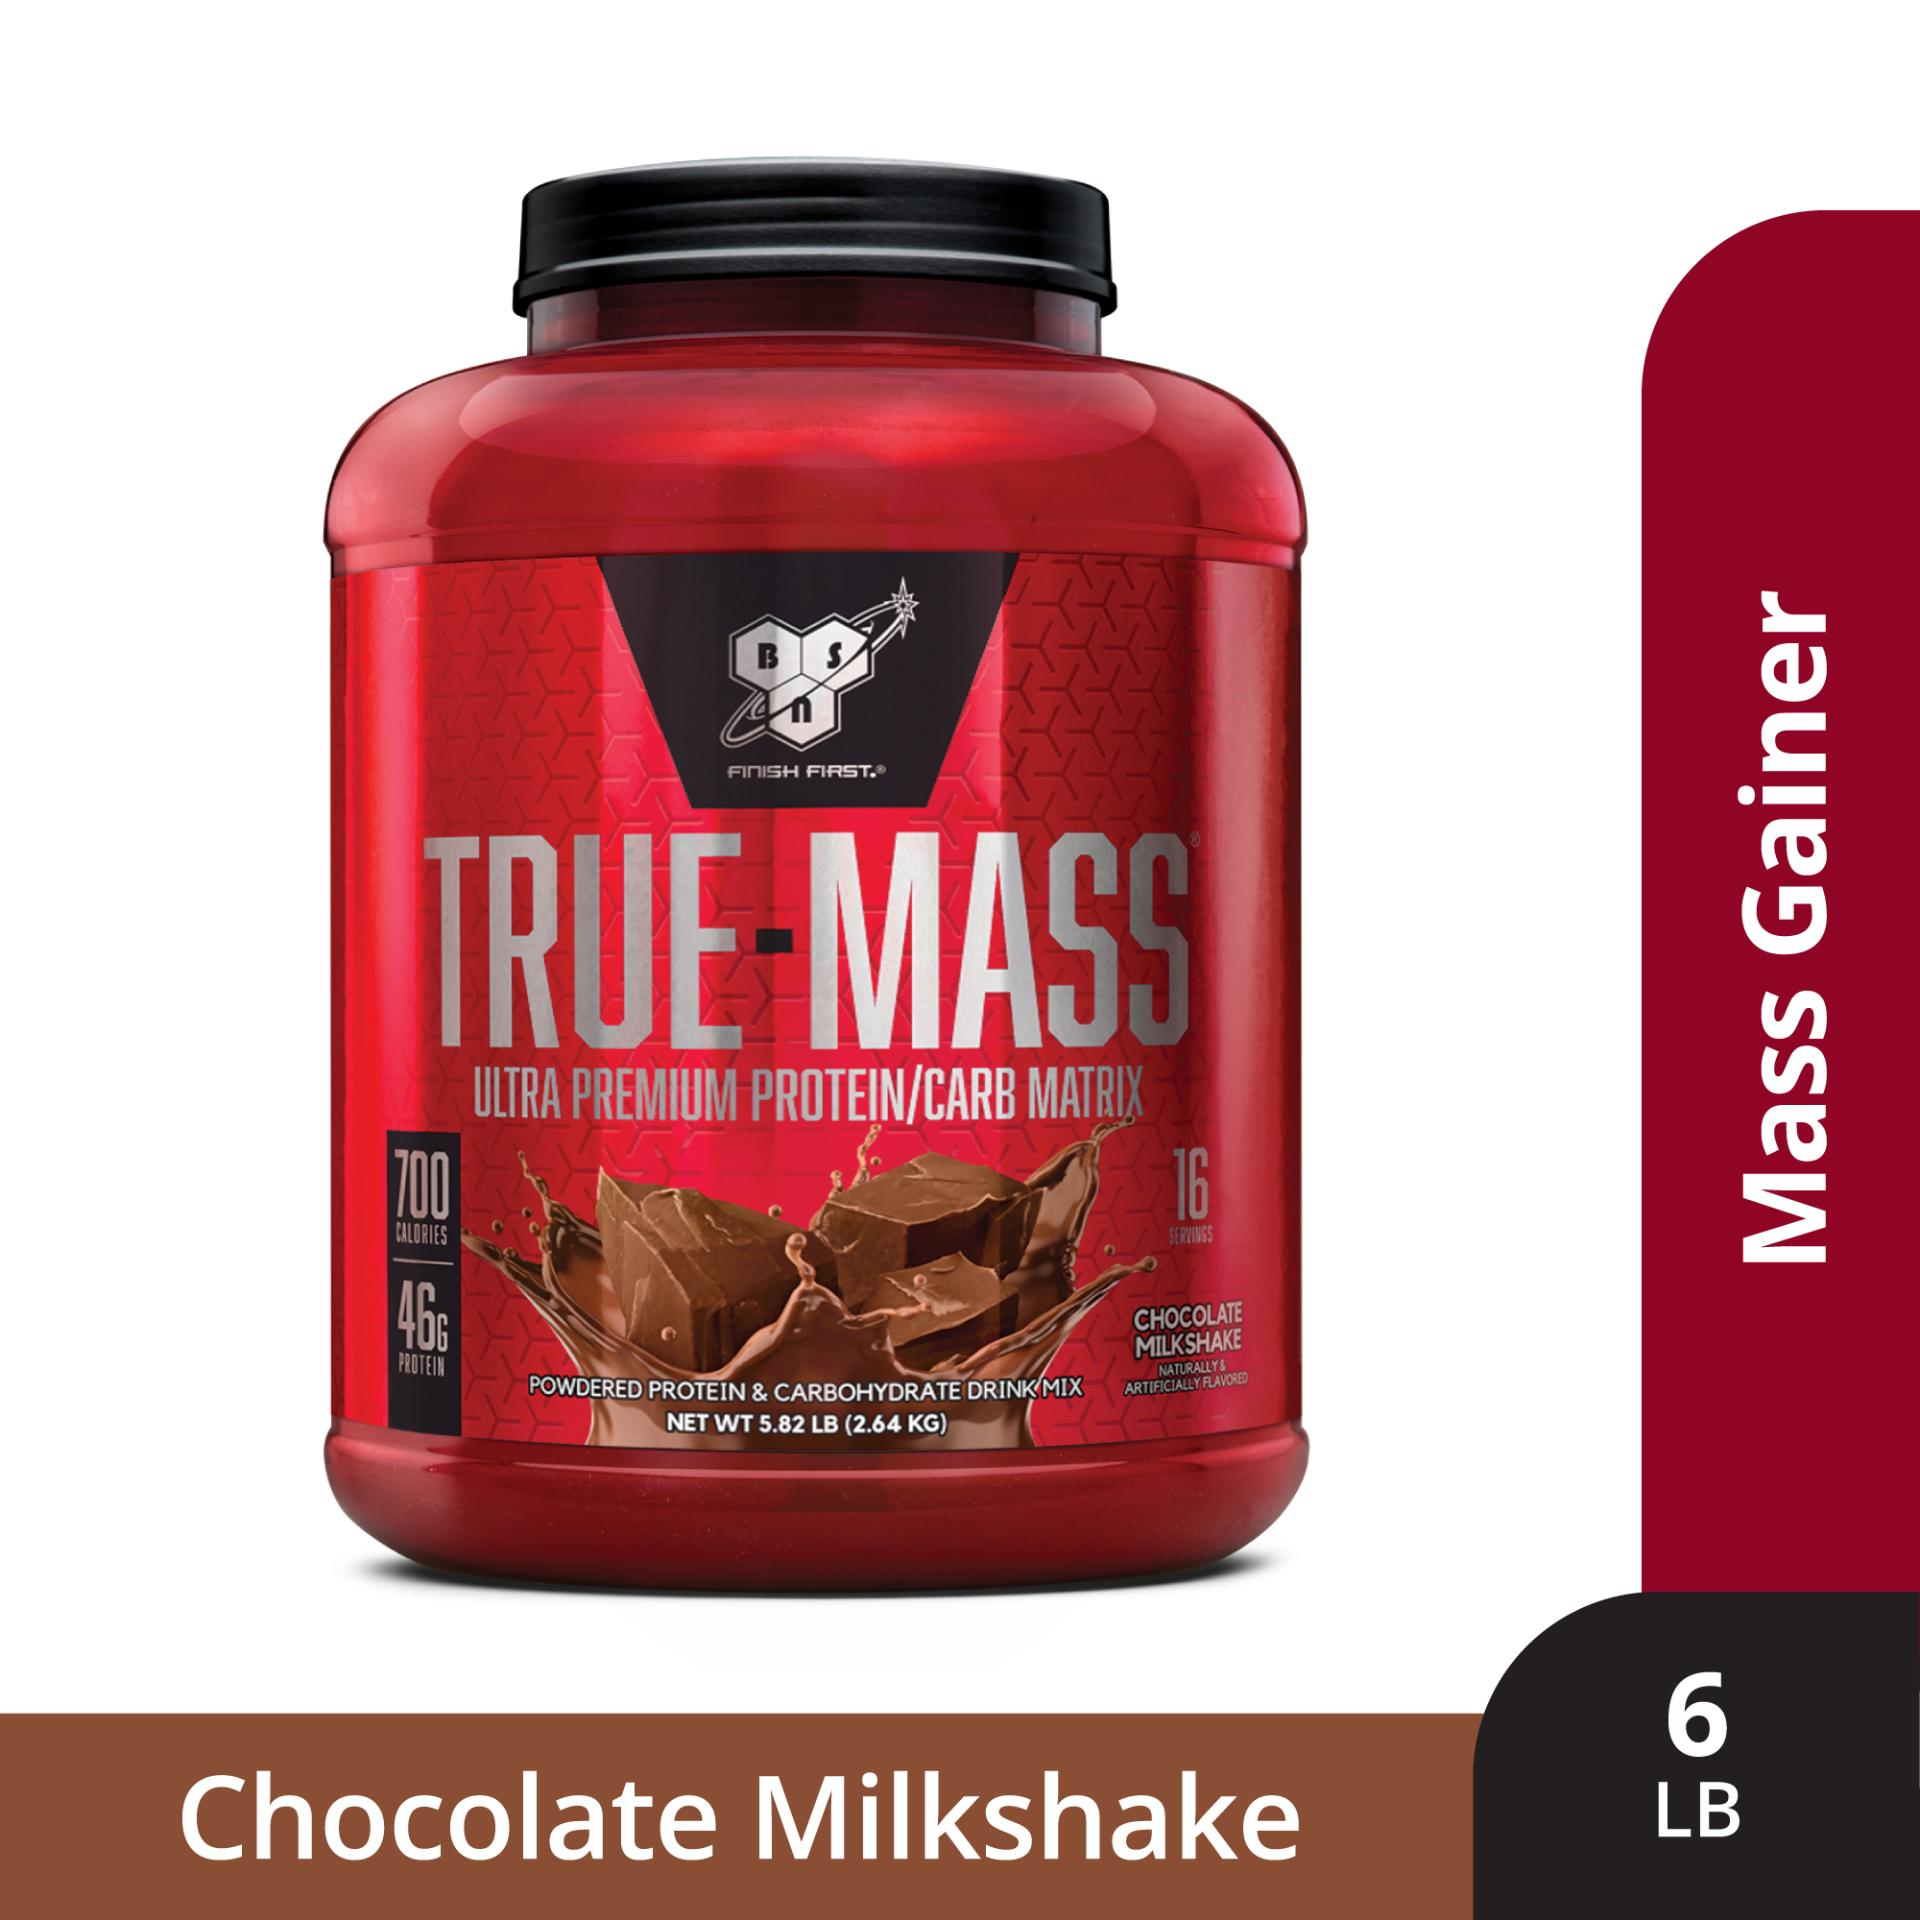 Thực phẩm bổ sungTrue Mass Chocolate Milkshake582 lbs nhập khẩu